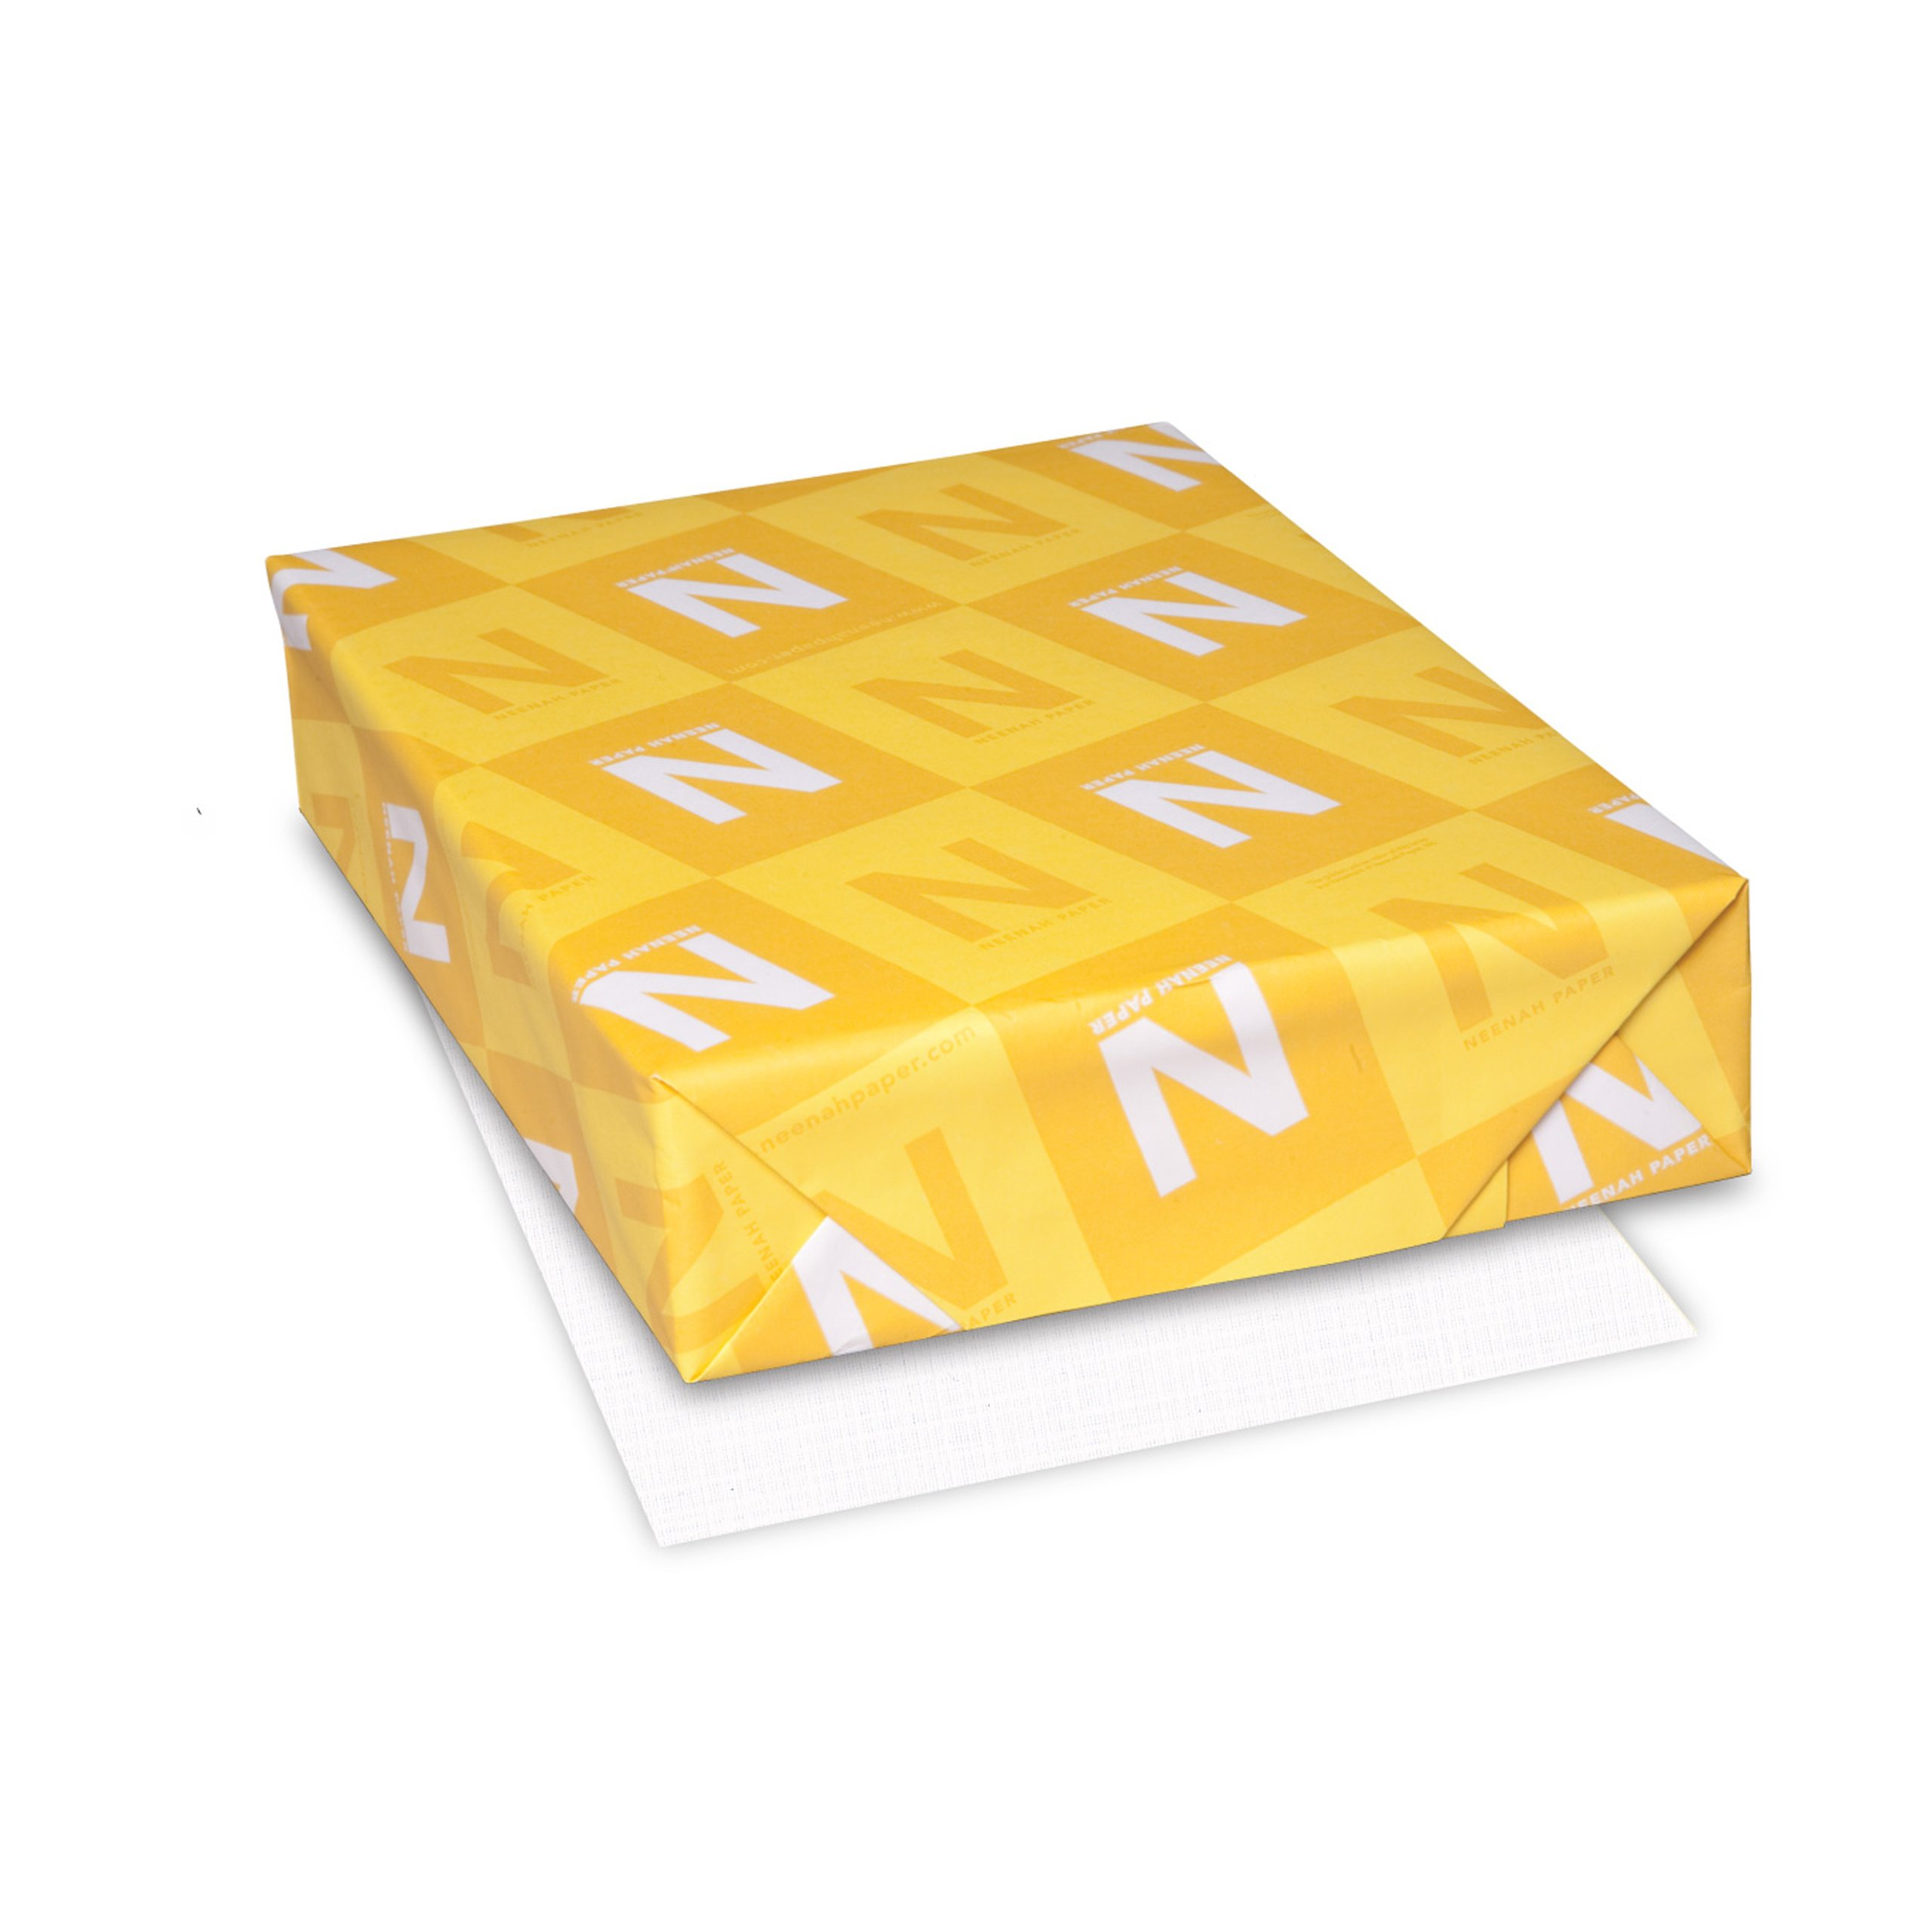 Neenah Royal Sundance Linen Writing Paper, 8.5'' x 11'', 24 lb/ 89 gsm, Bright White, 96 Brightness, 500 Sheets (75061) by Neenah